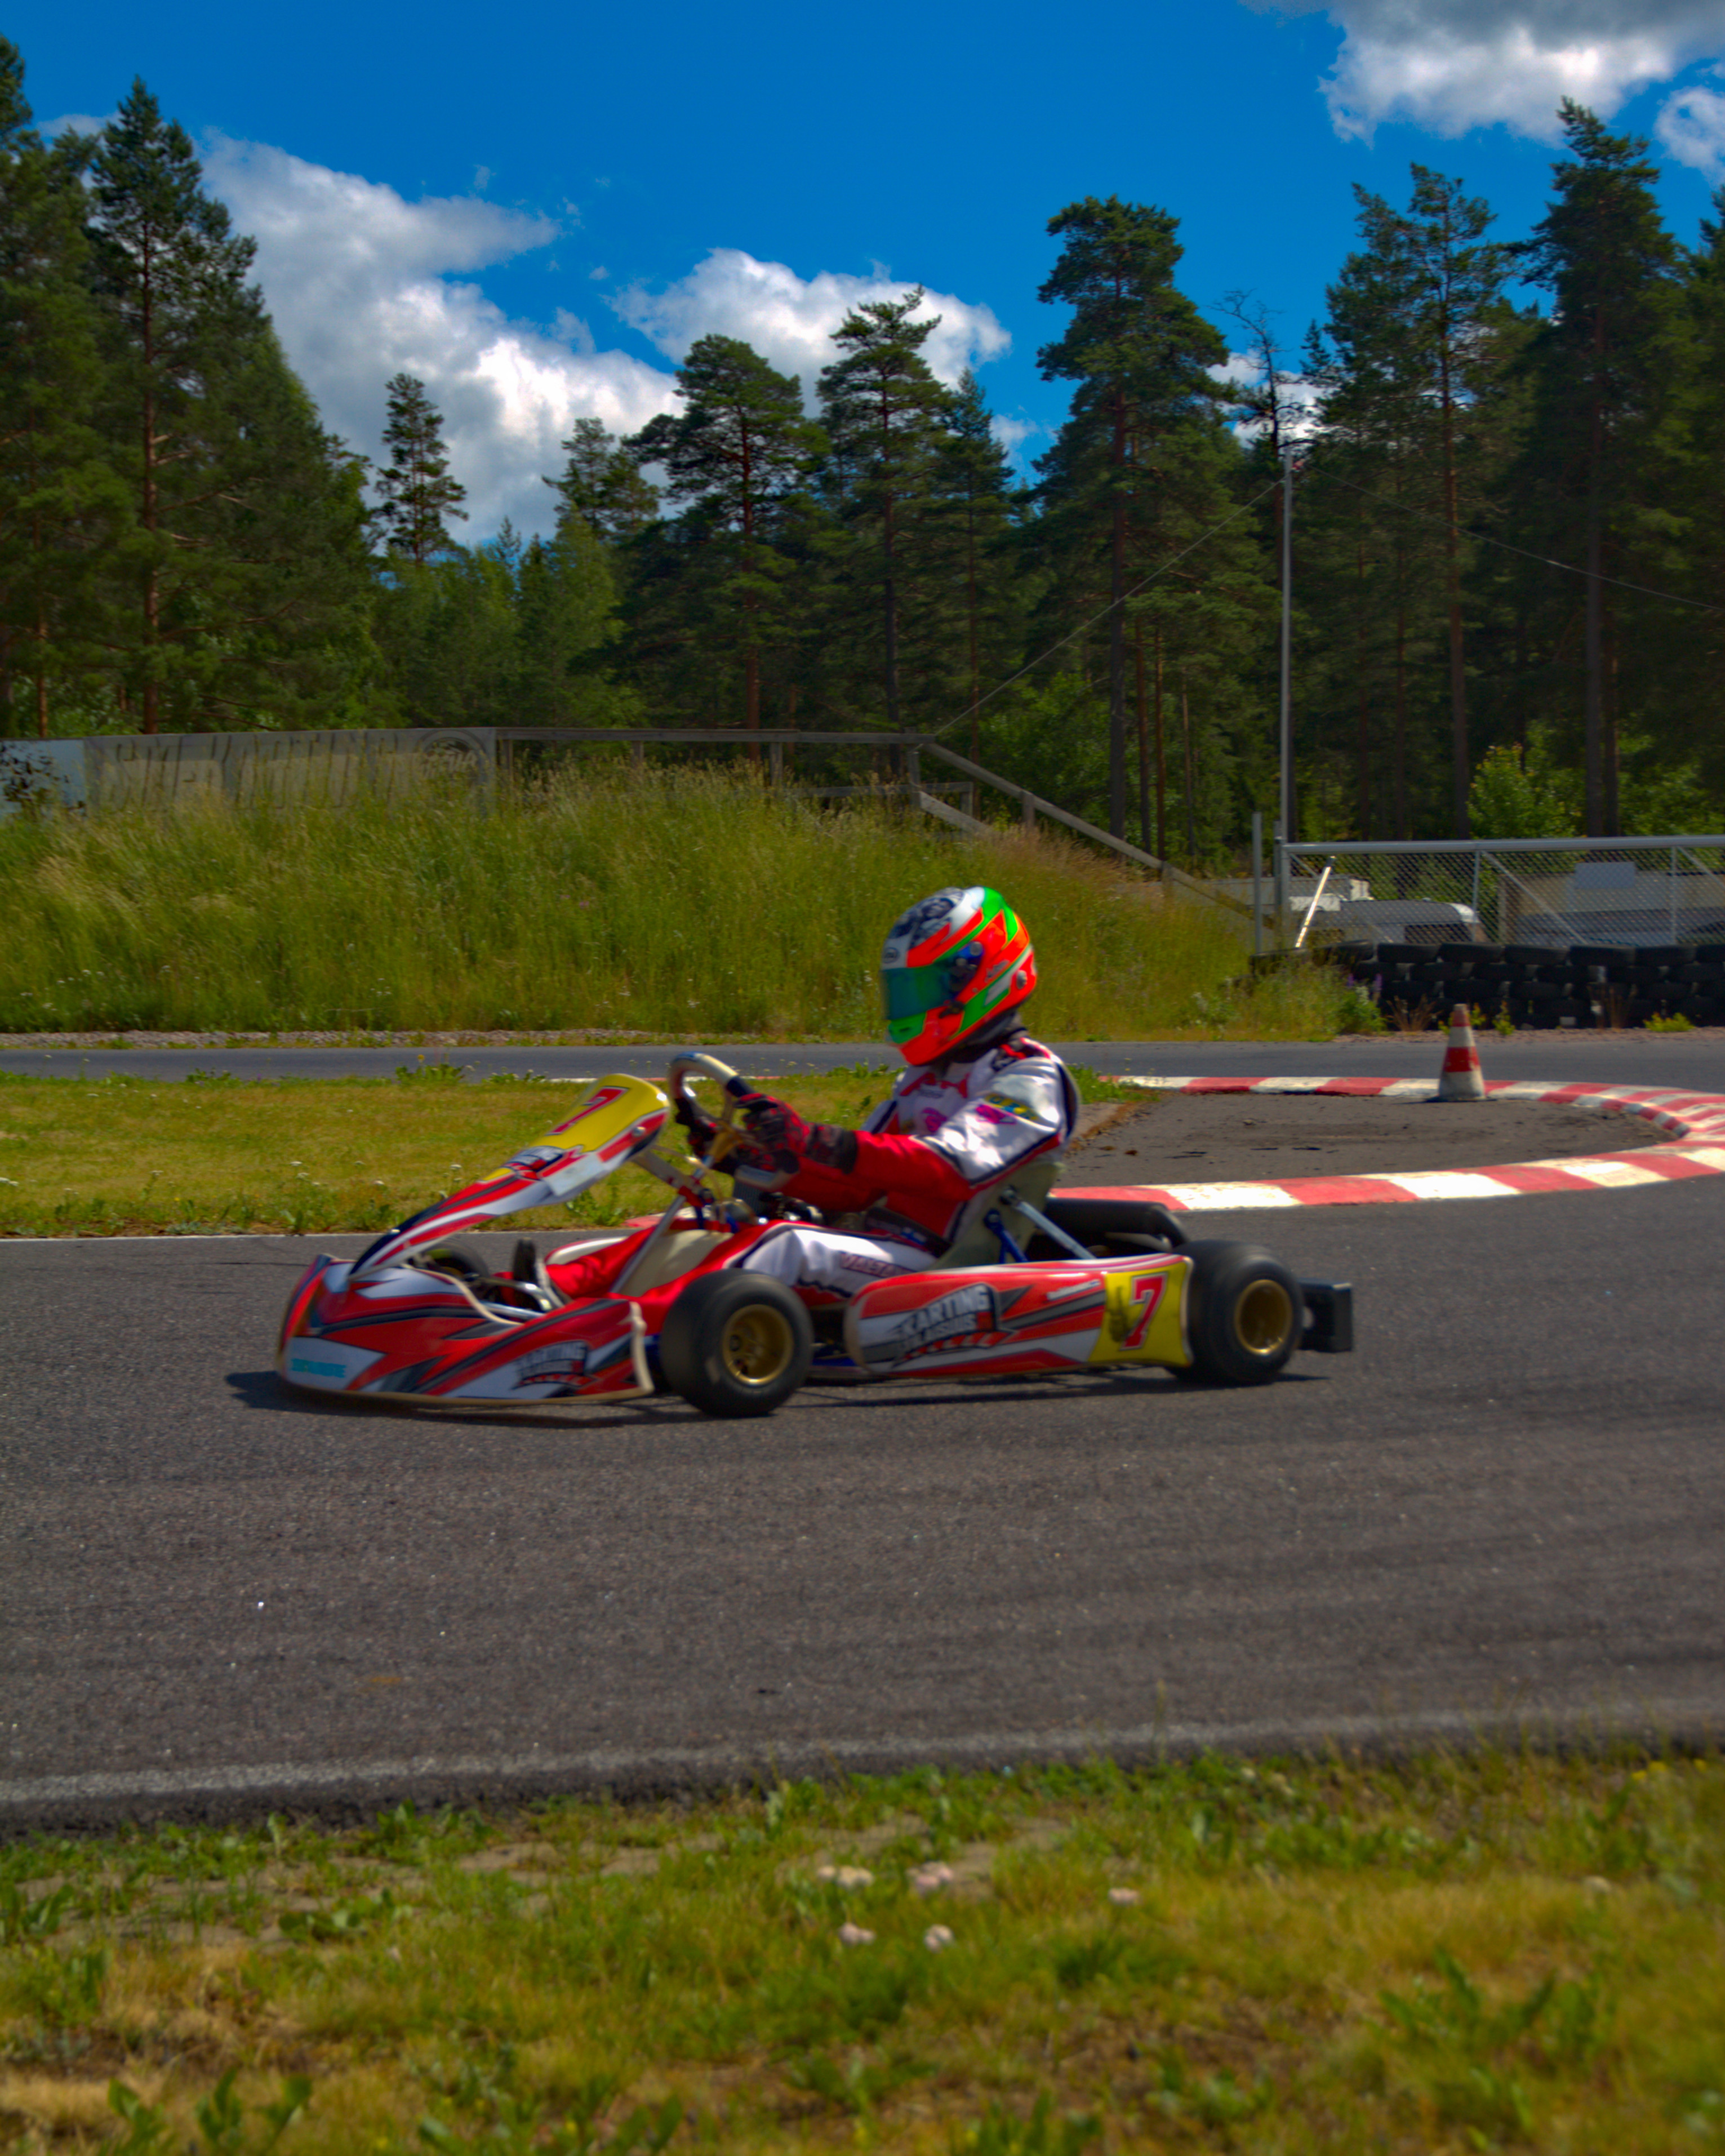 Karting GP 19 henkilöä